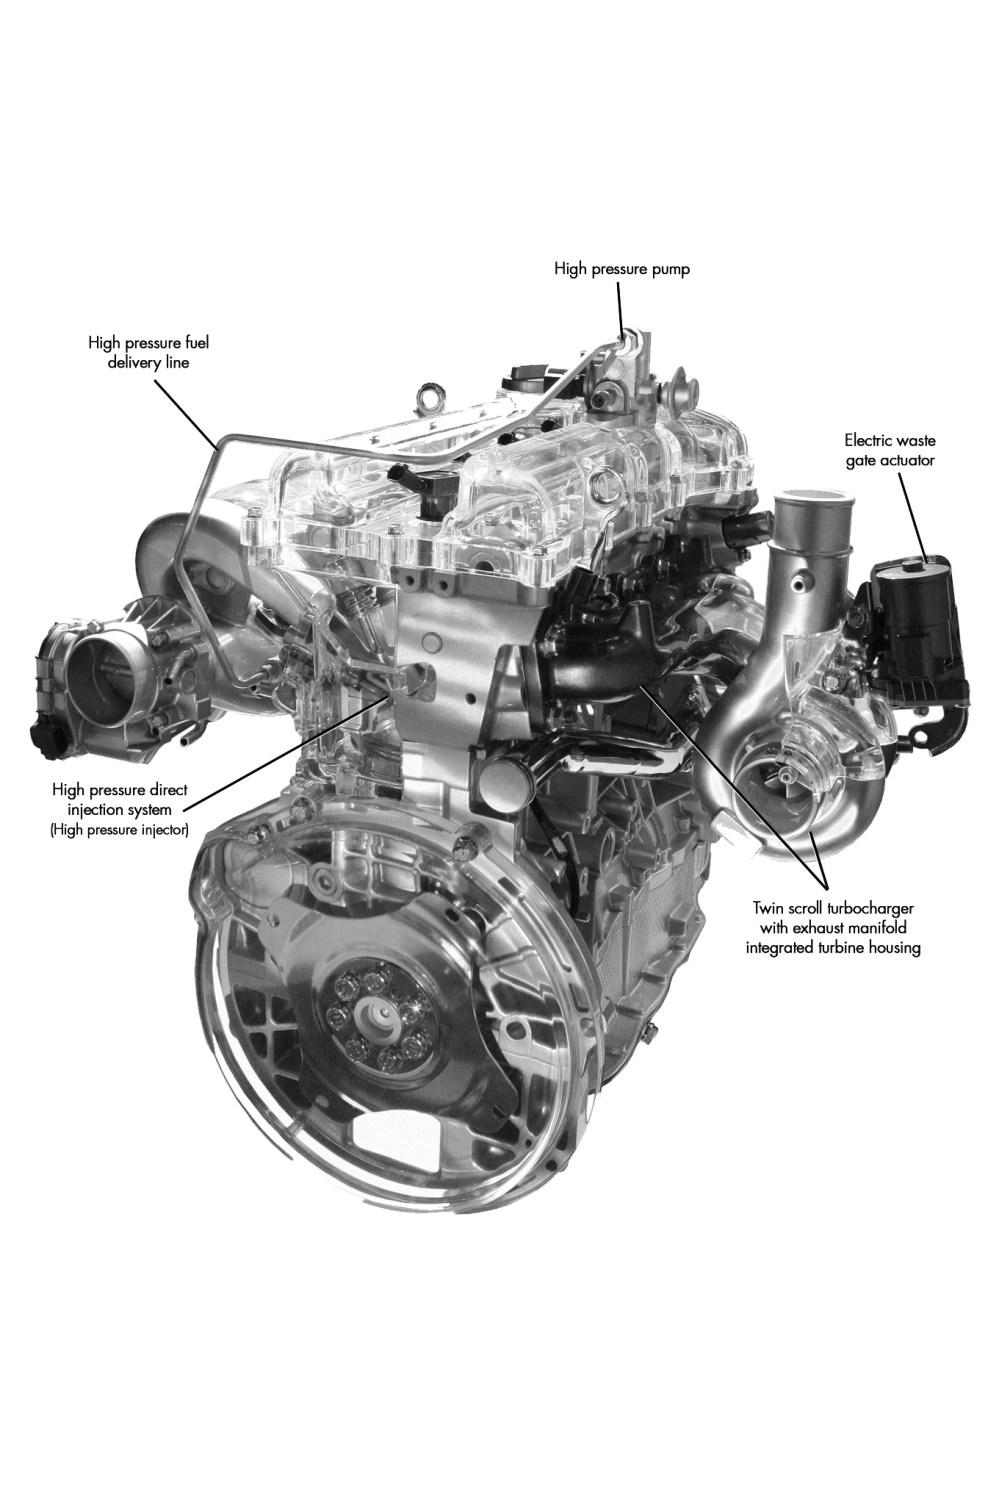 medium resolution of hyundai 2 4 engine parts diagram wiring library 2013 hyundai sonata 20t engine 7 hyundai 2